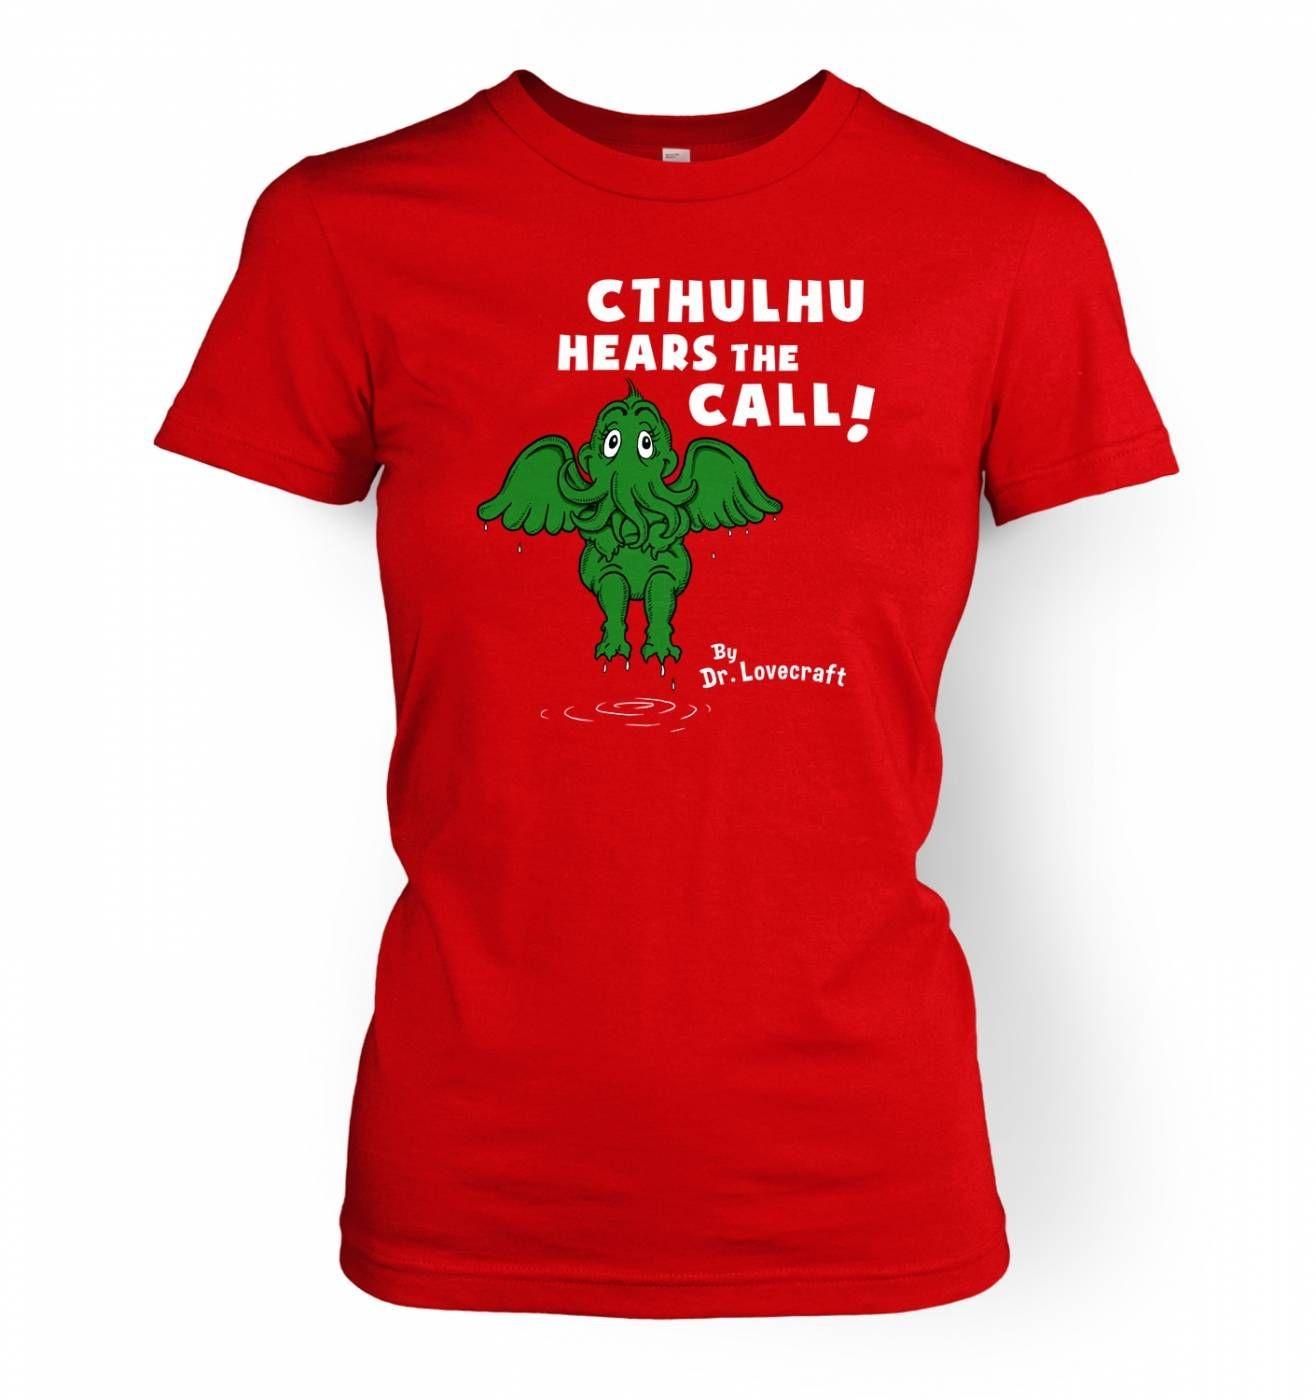 Cthulhu Hears The Call Dr Lovecraft women's t-shirt